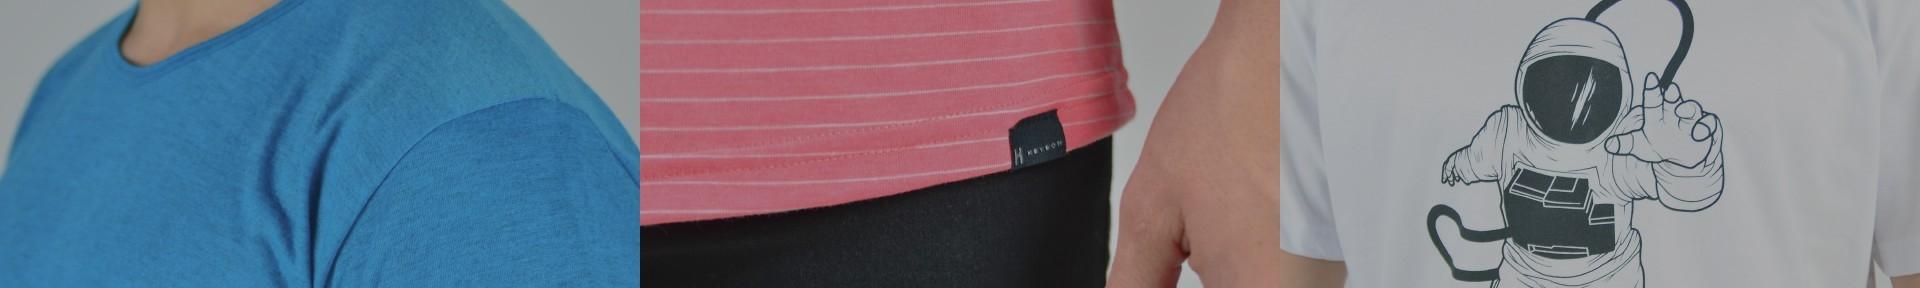 Remeras y camisas - Heybon  Clothes - Indumentaria masculina